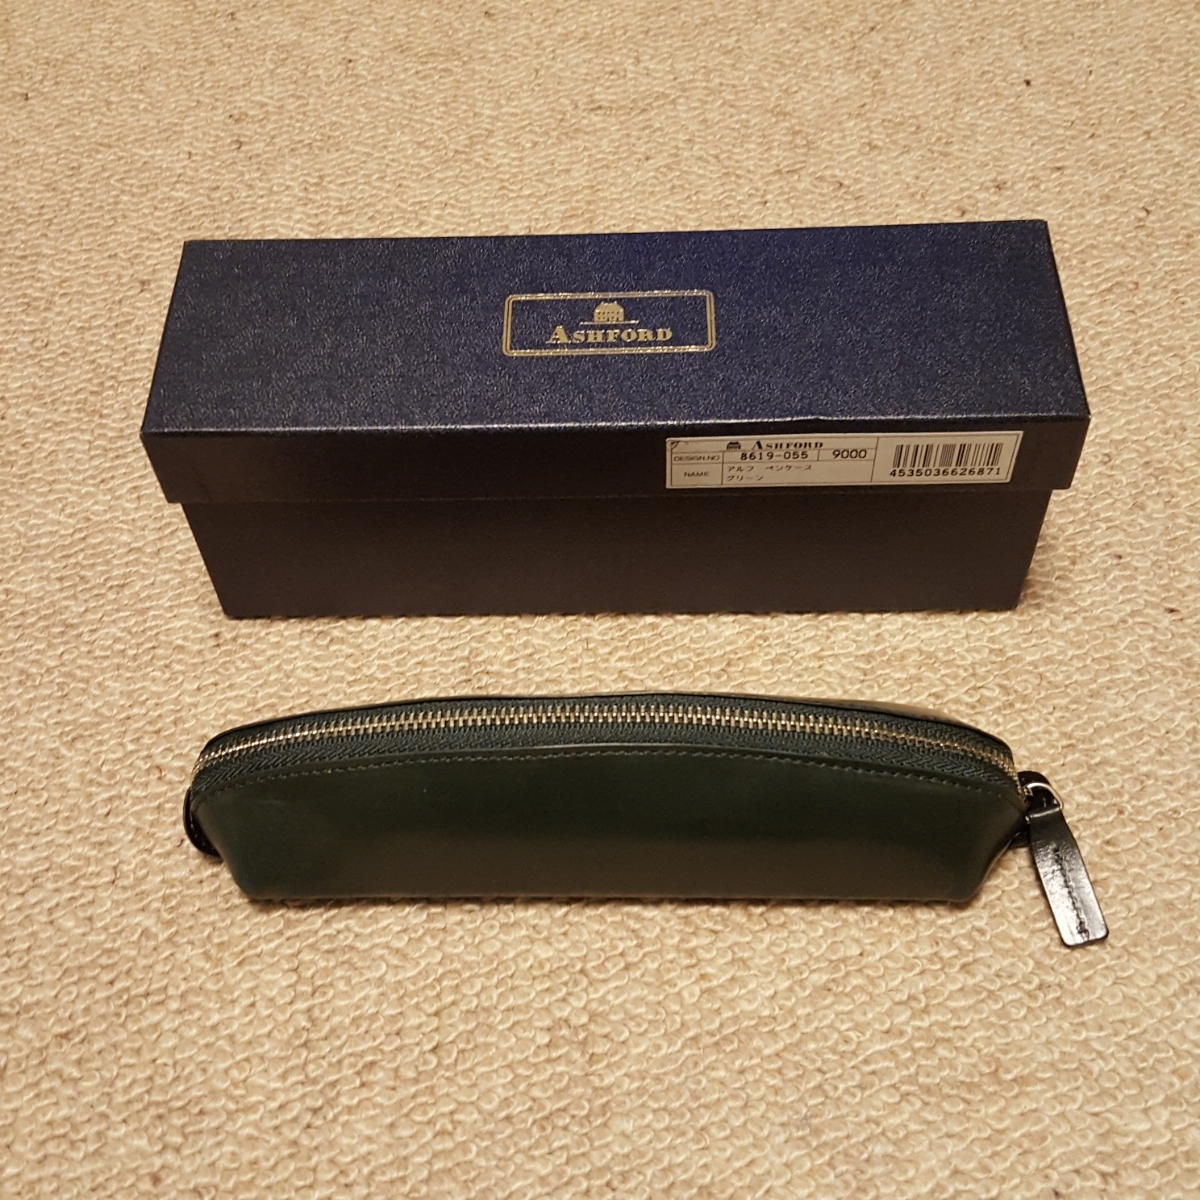 Ashford アシュフォード アルフ ペンケース グリーン 緑 筆箱 レザー ボールペン 万年筆 付属品完